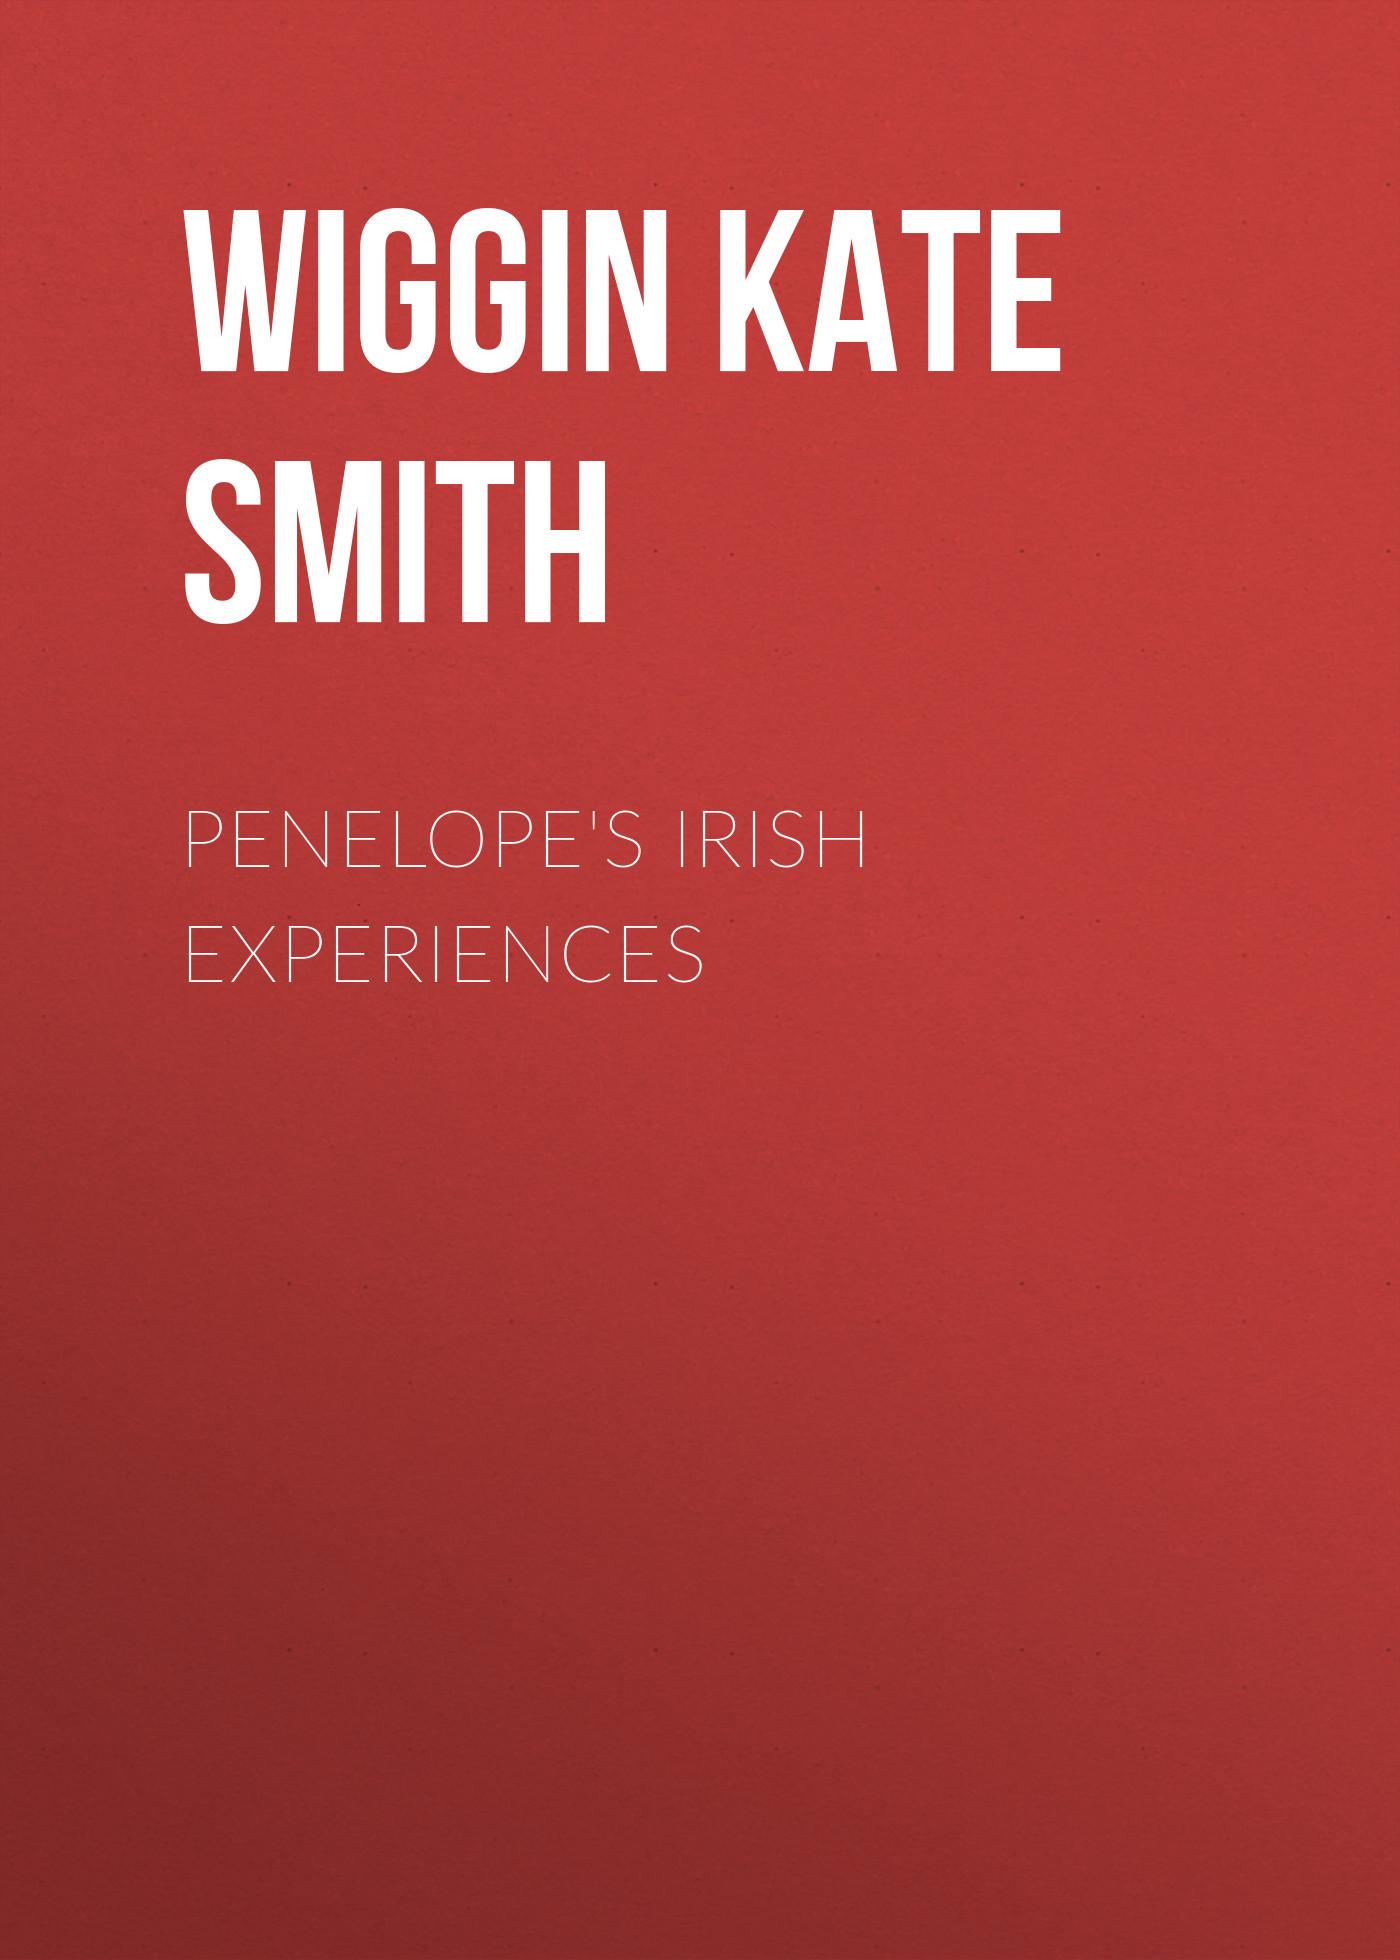 Wiggin Kate Douglas Smith Penelope's Irish Experiences gift experiences